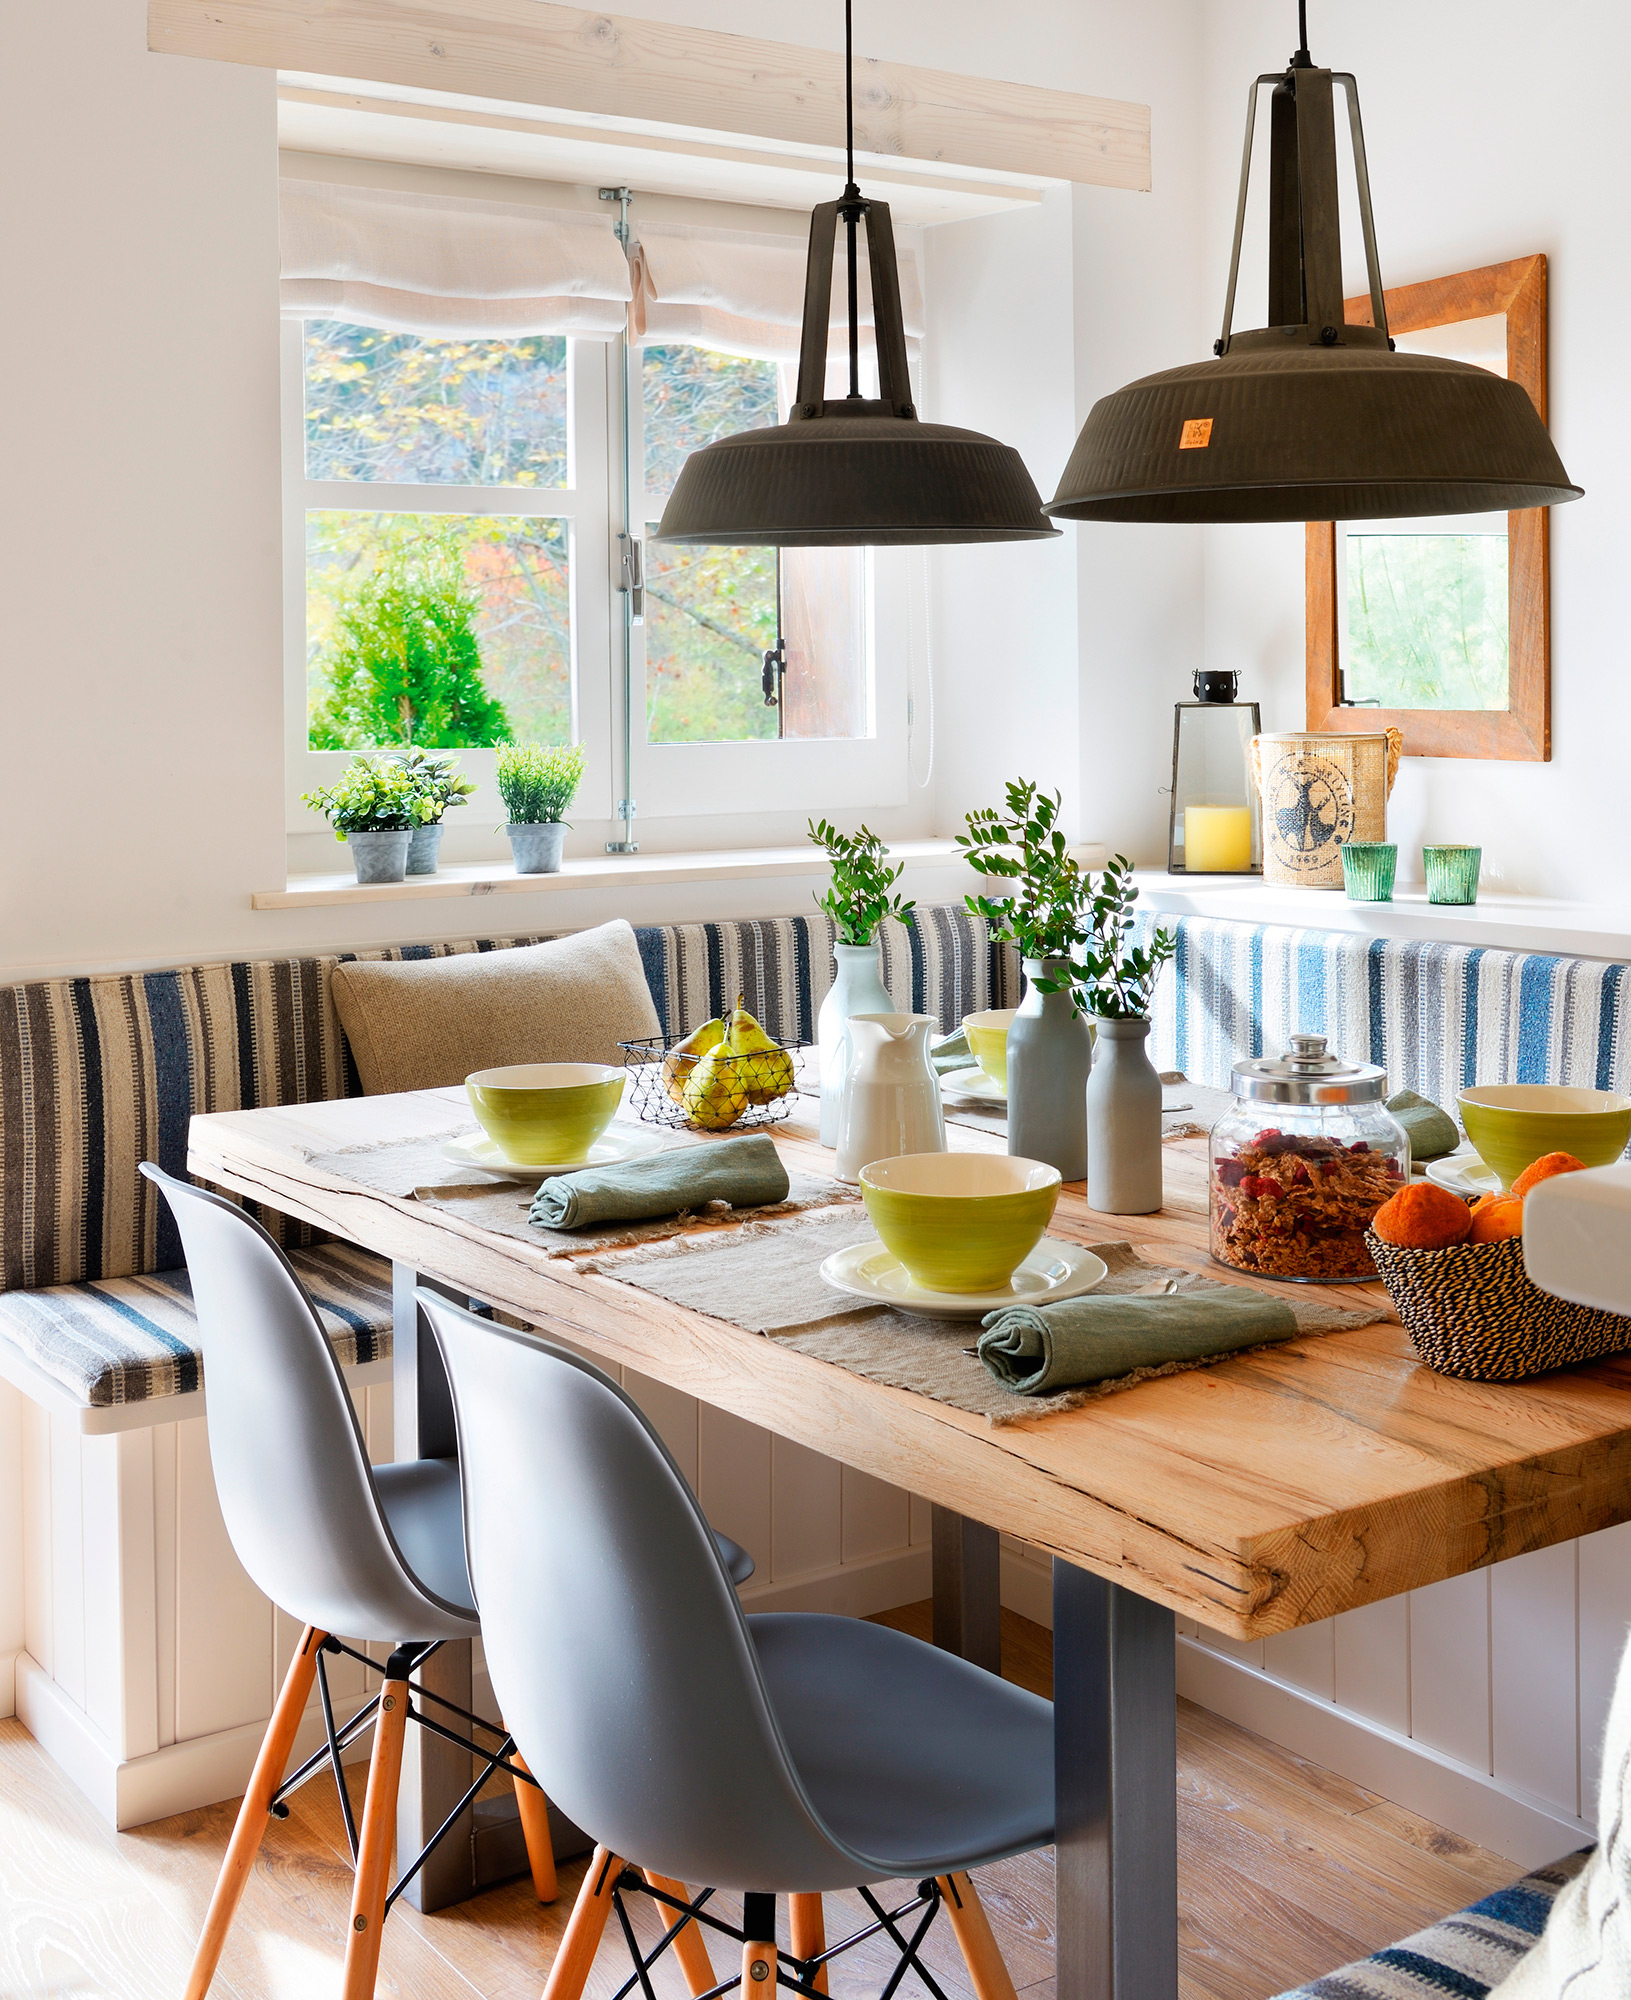 Mesas Y Sillas Para Comedor Pequeno Of Comedores Para Espacios Peque Os